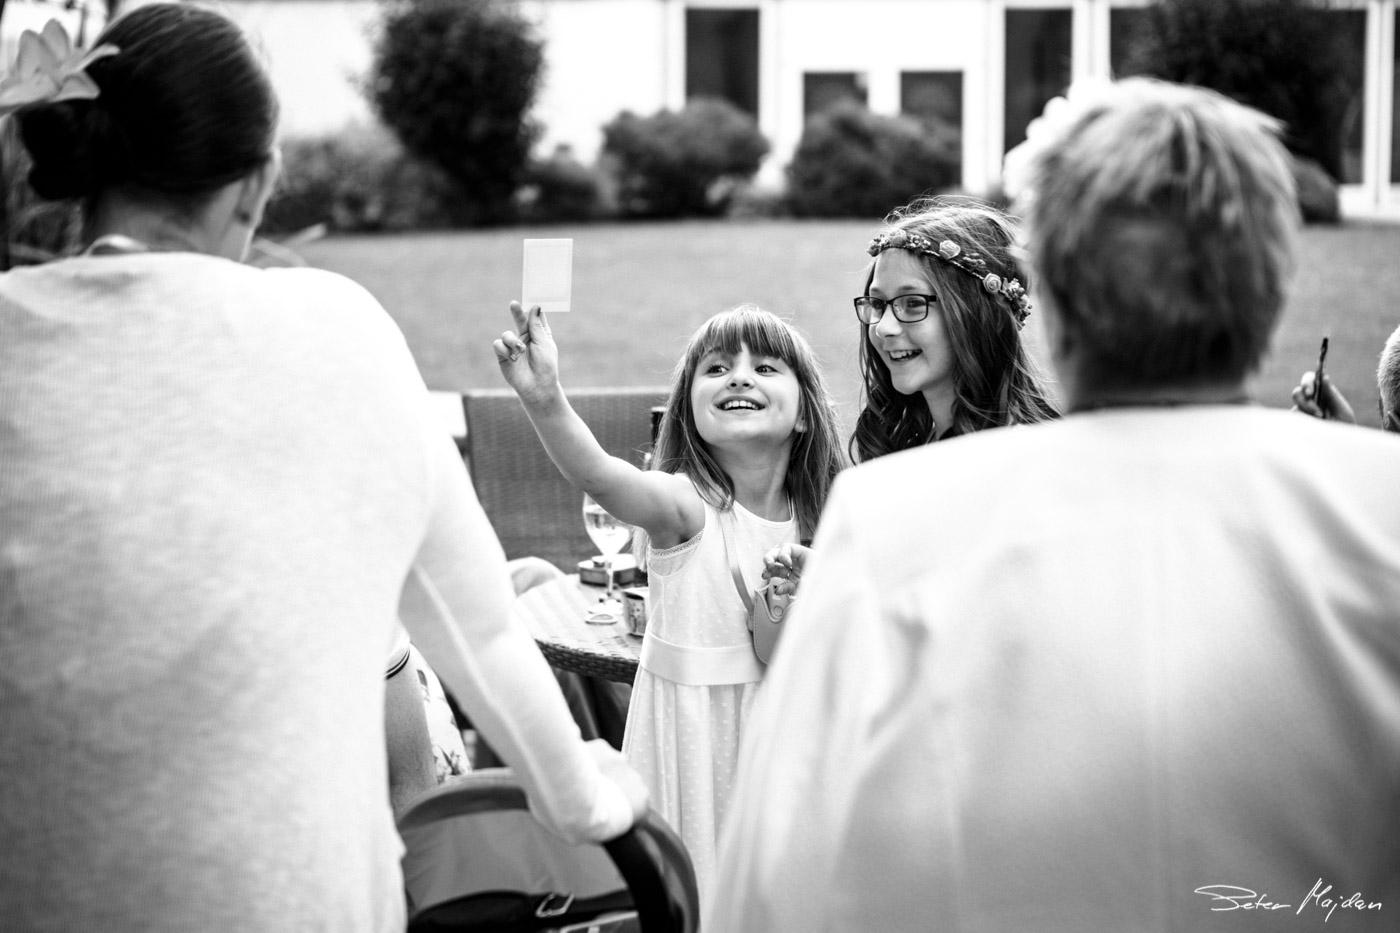 Colwick-hall-wedding-photography-55.jpg